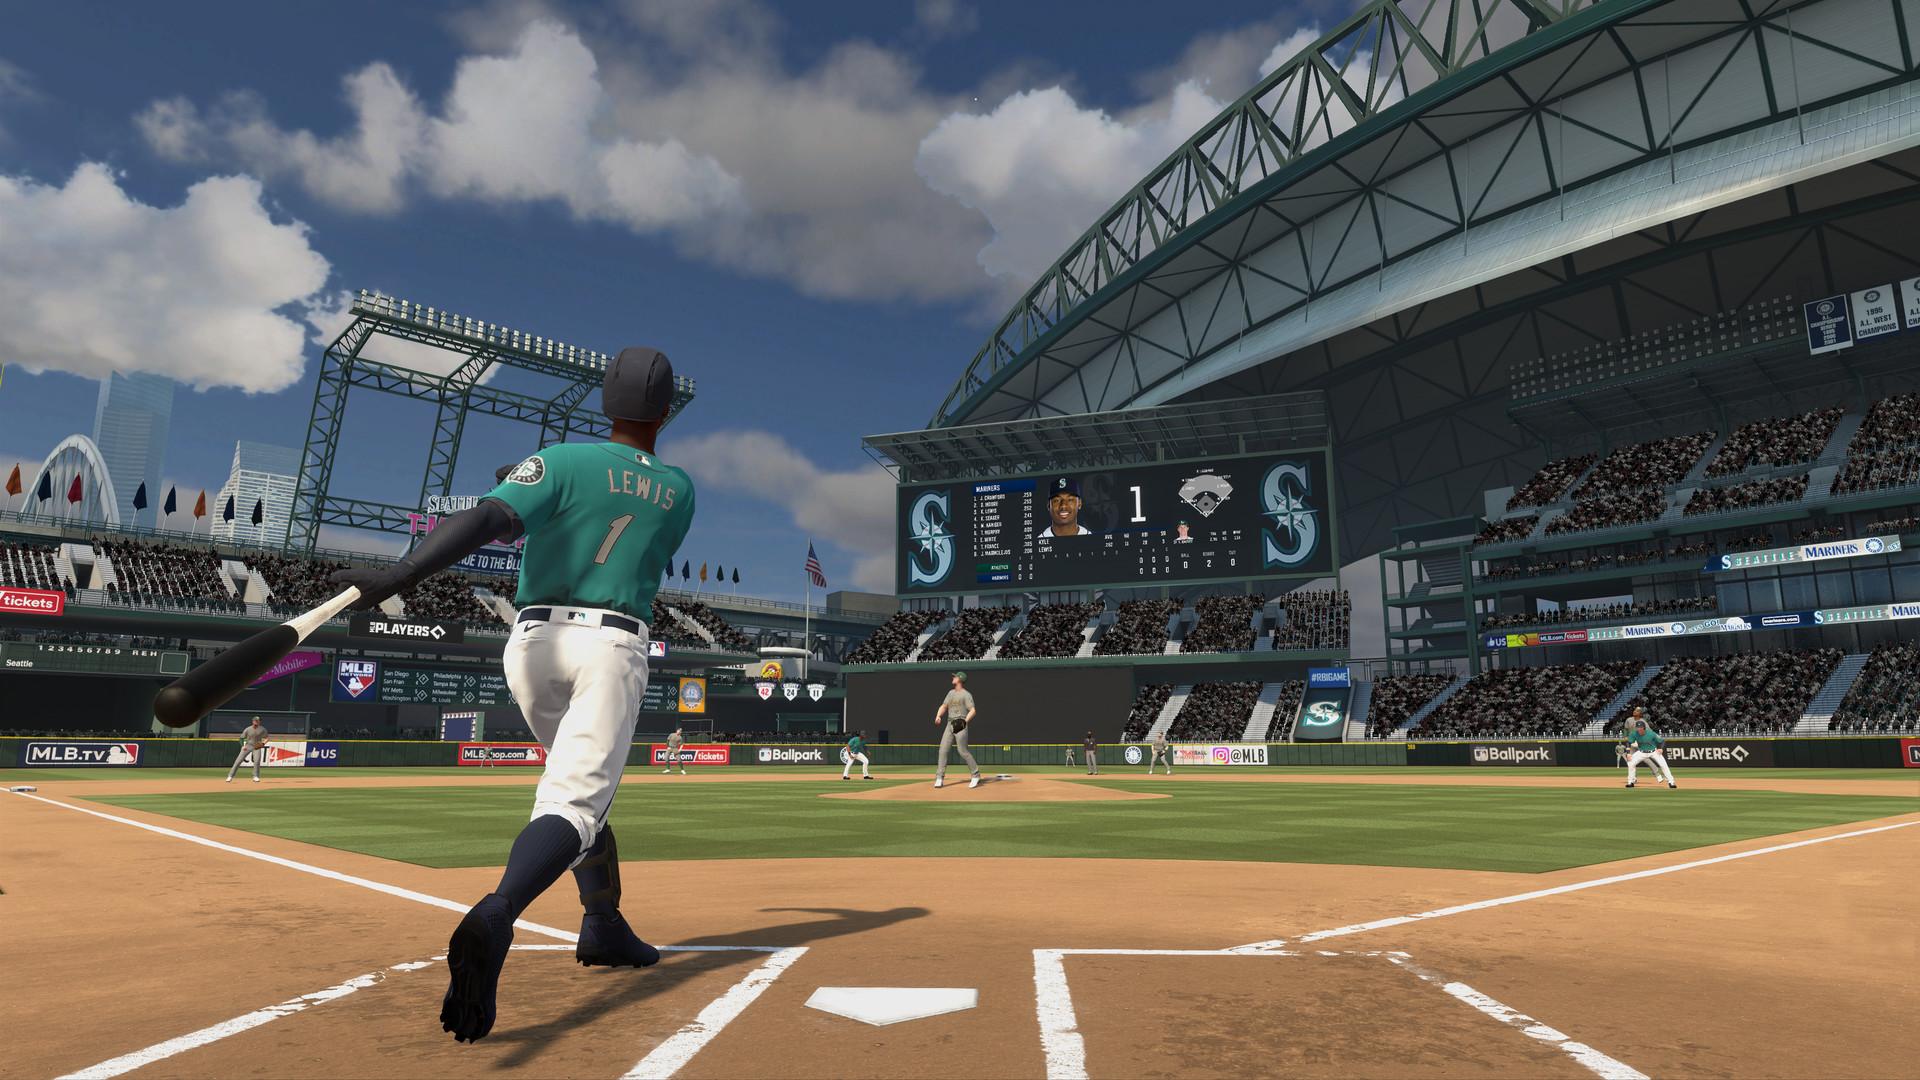 rbi-baseball-21-pc-screenshot-4